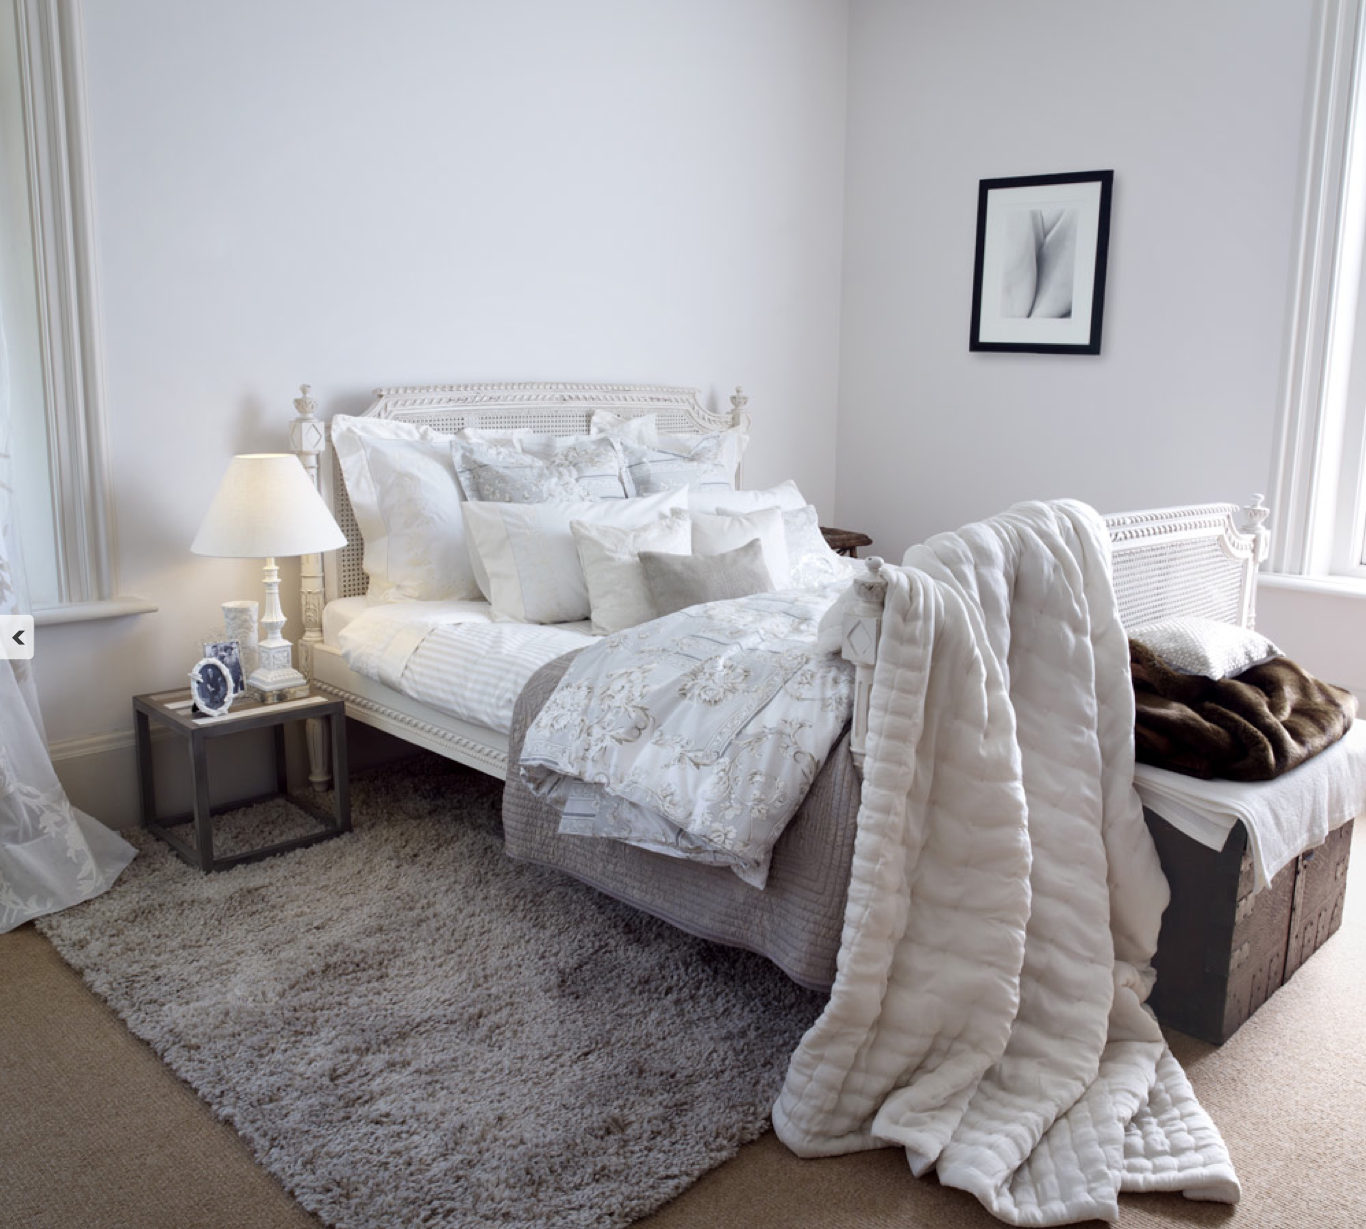 Oto o invierno en zara home estudio lota for Muebles zara home catalogo